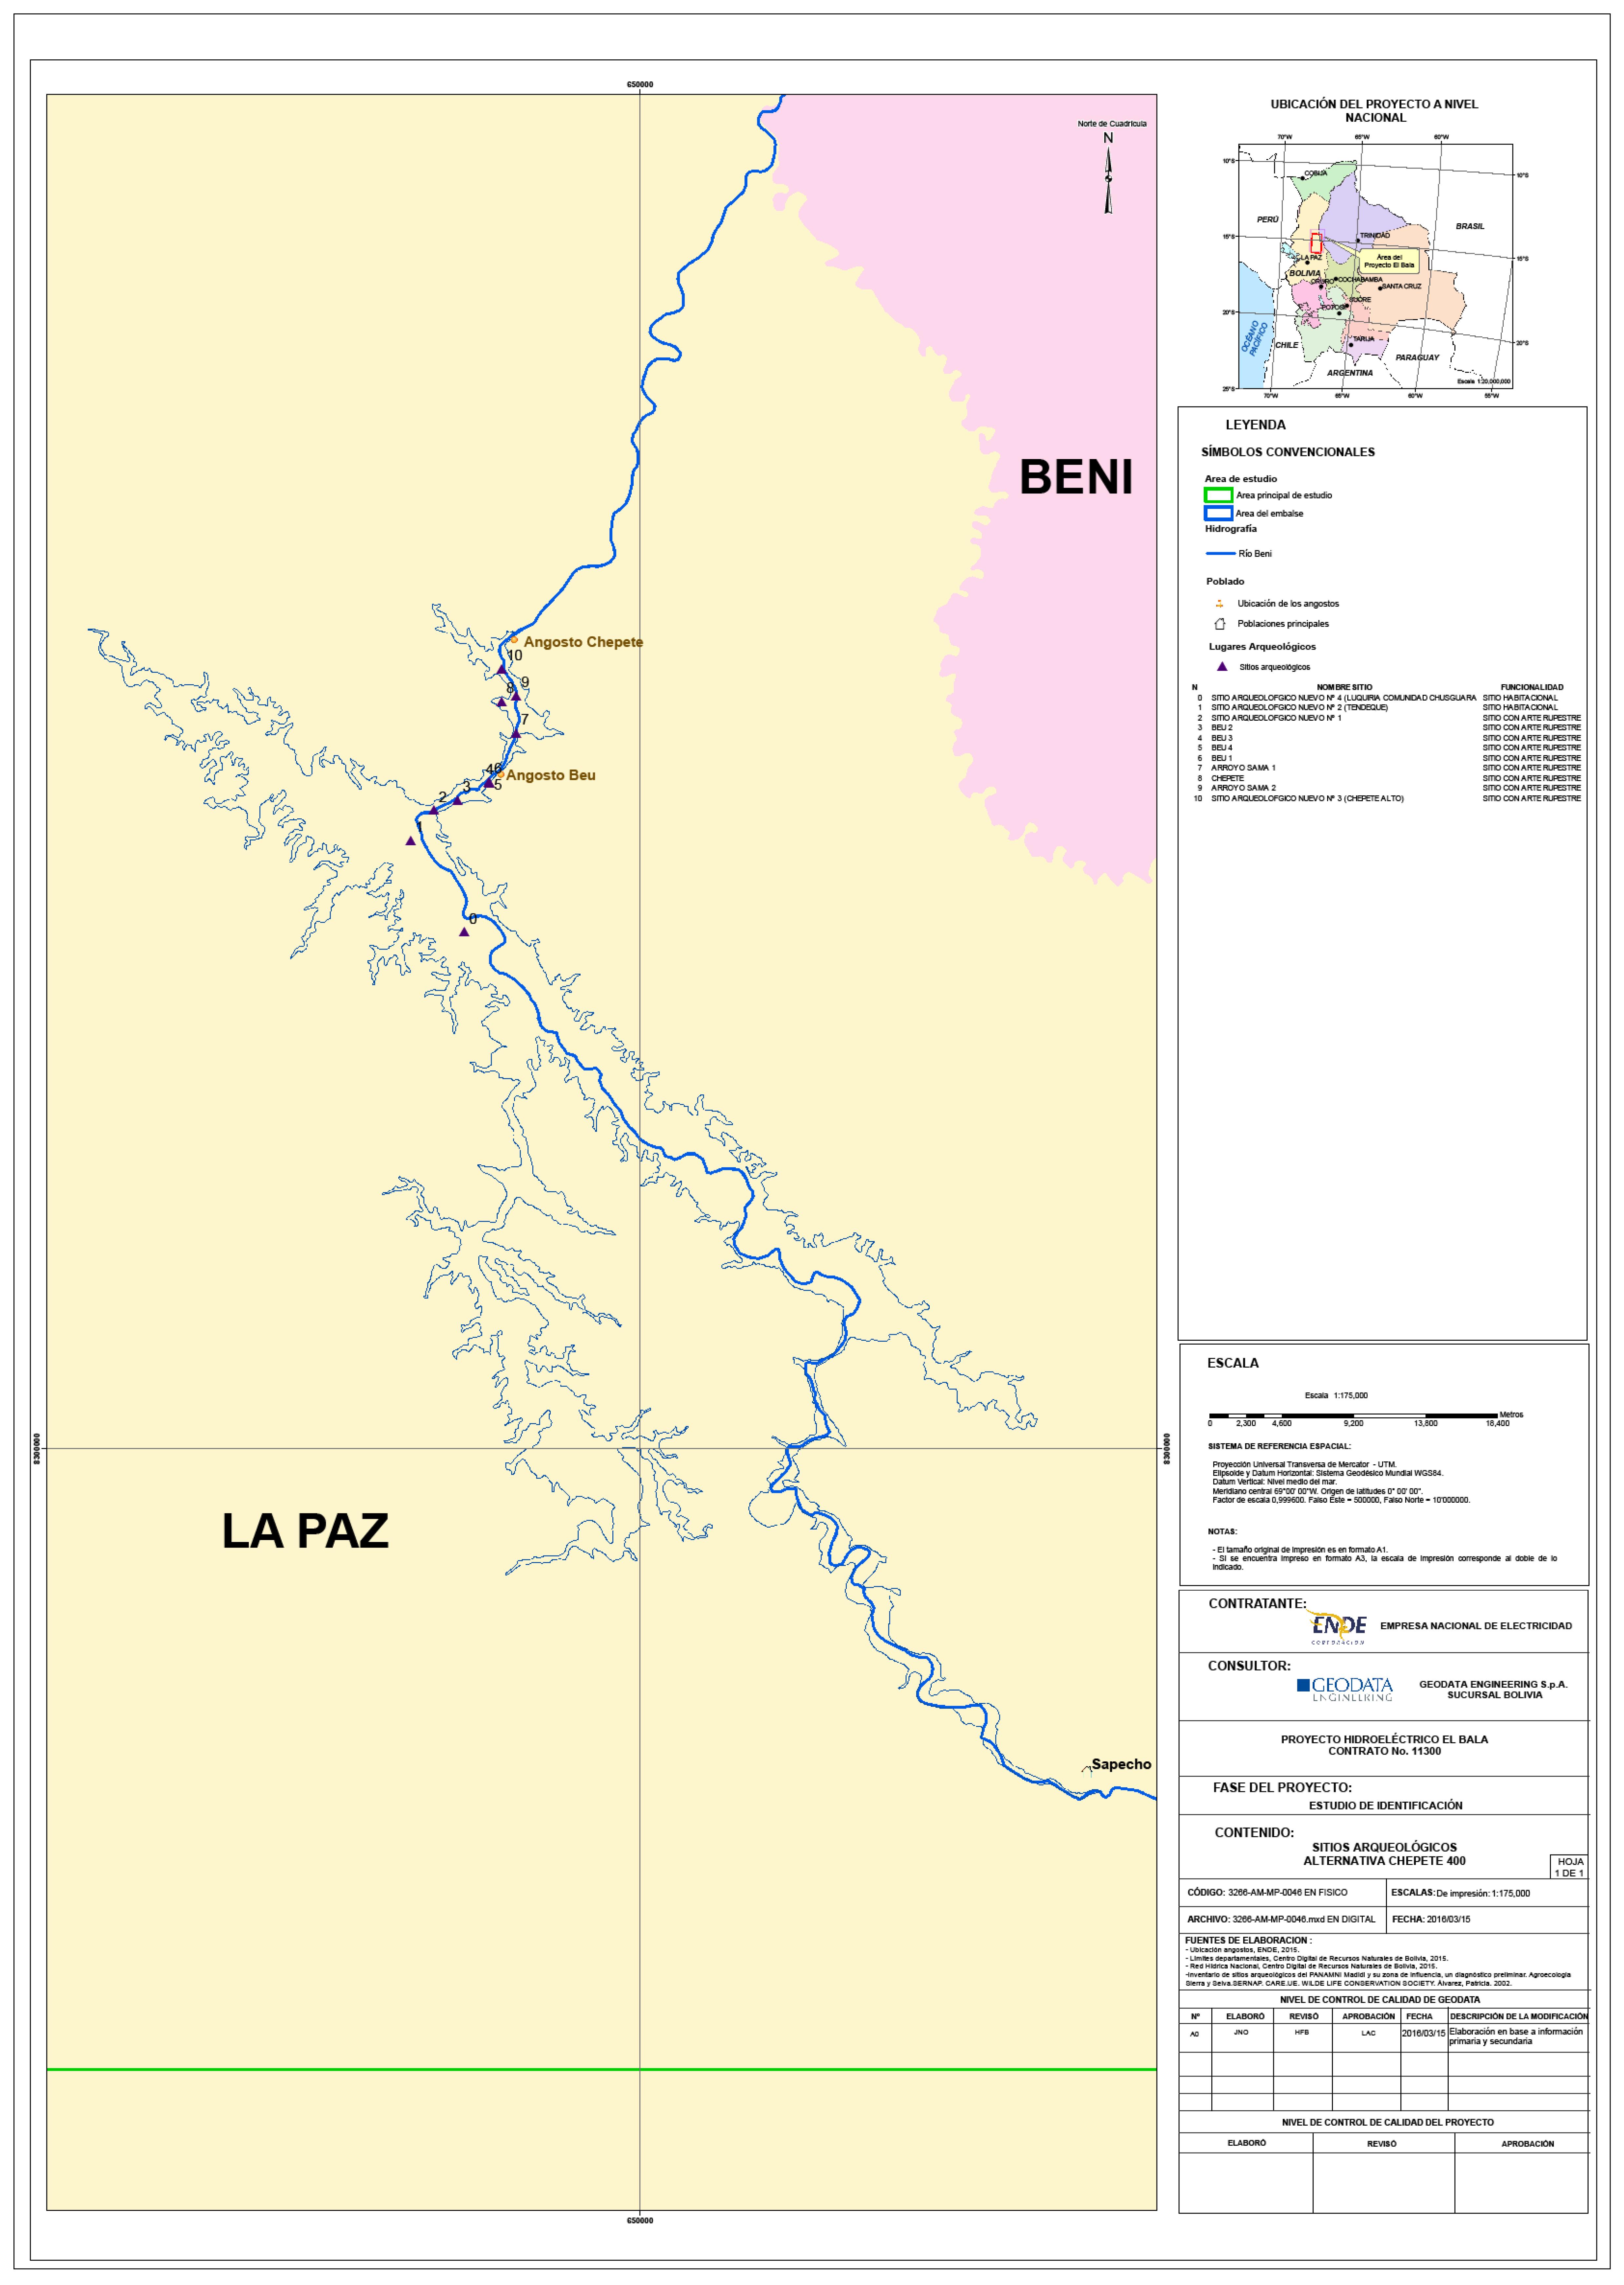 Mapa arqueologico